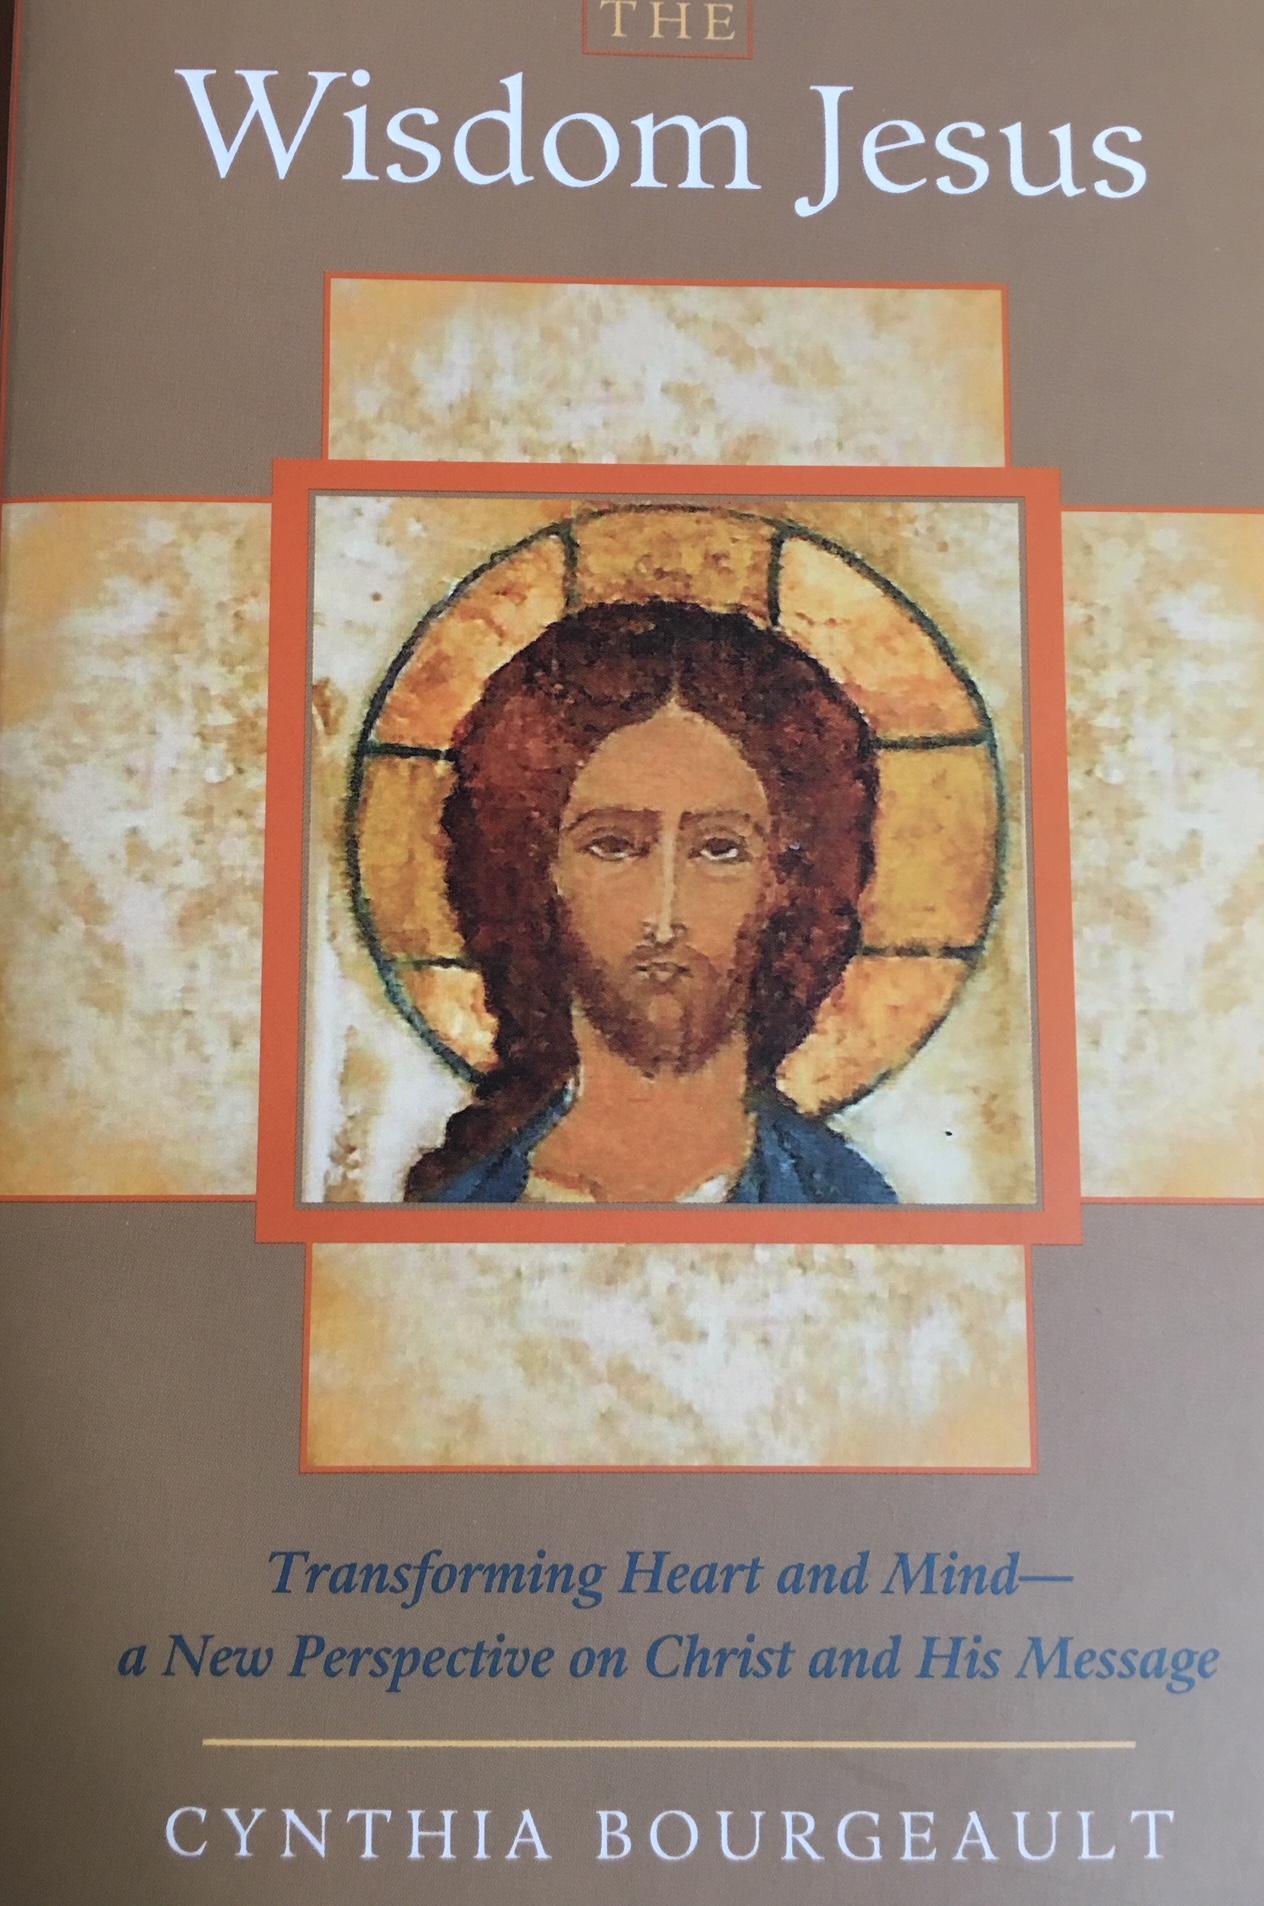 wisdom jesus 2.jpg